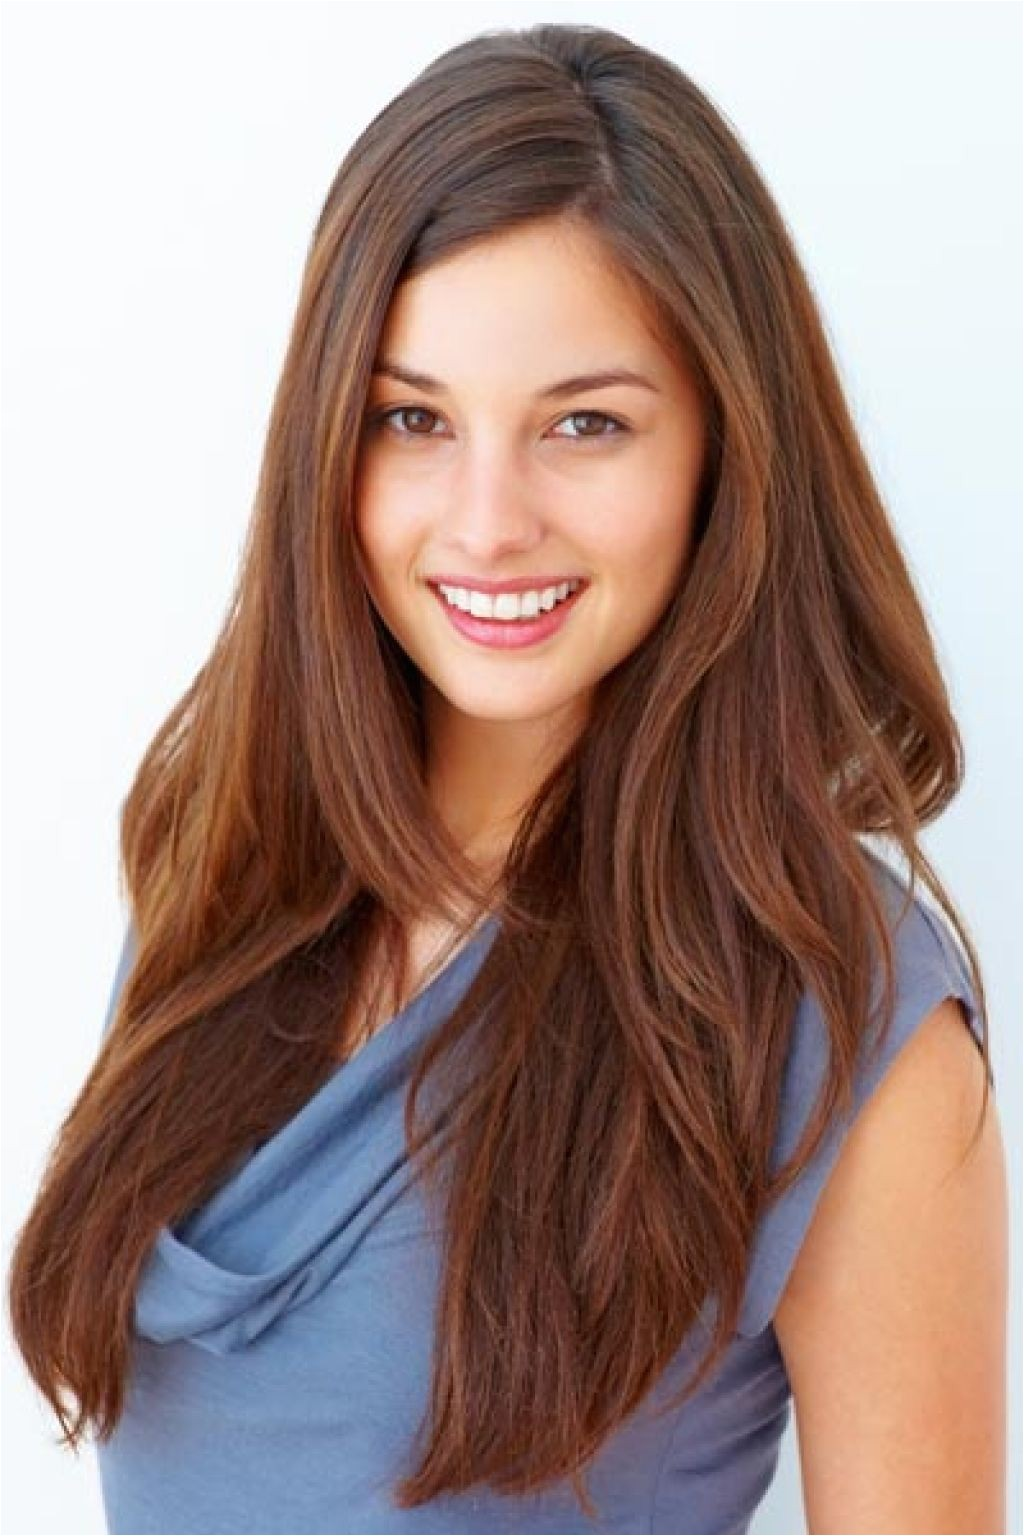 laser cut hairstyle long hair